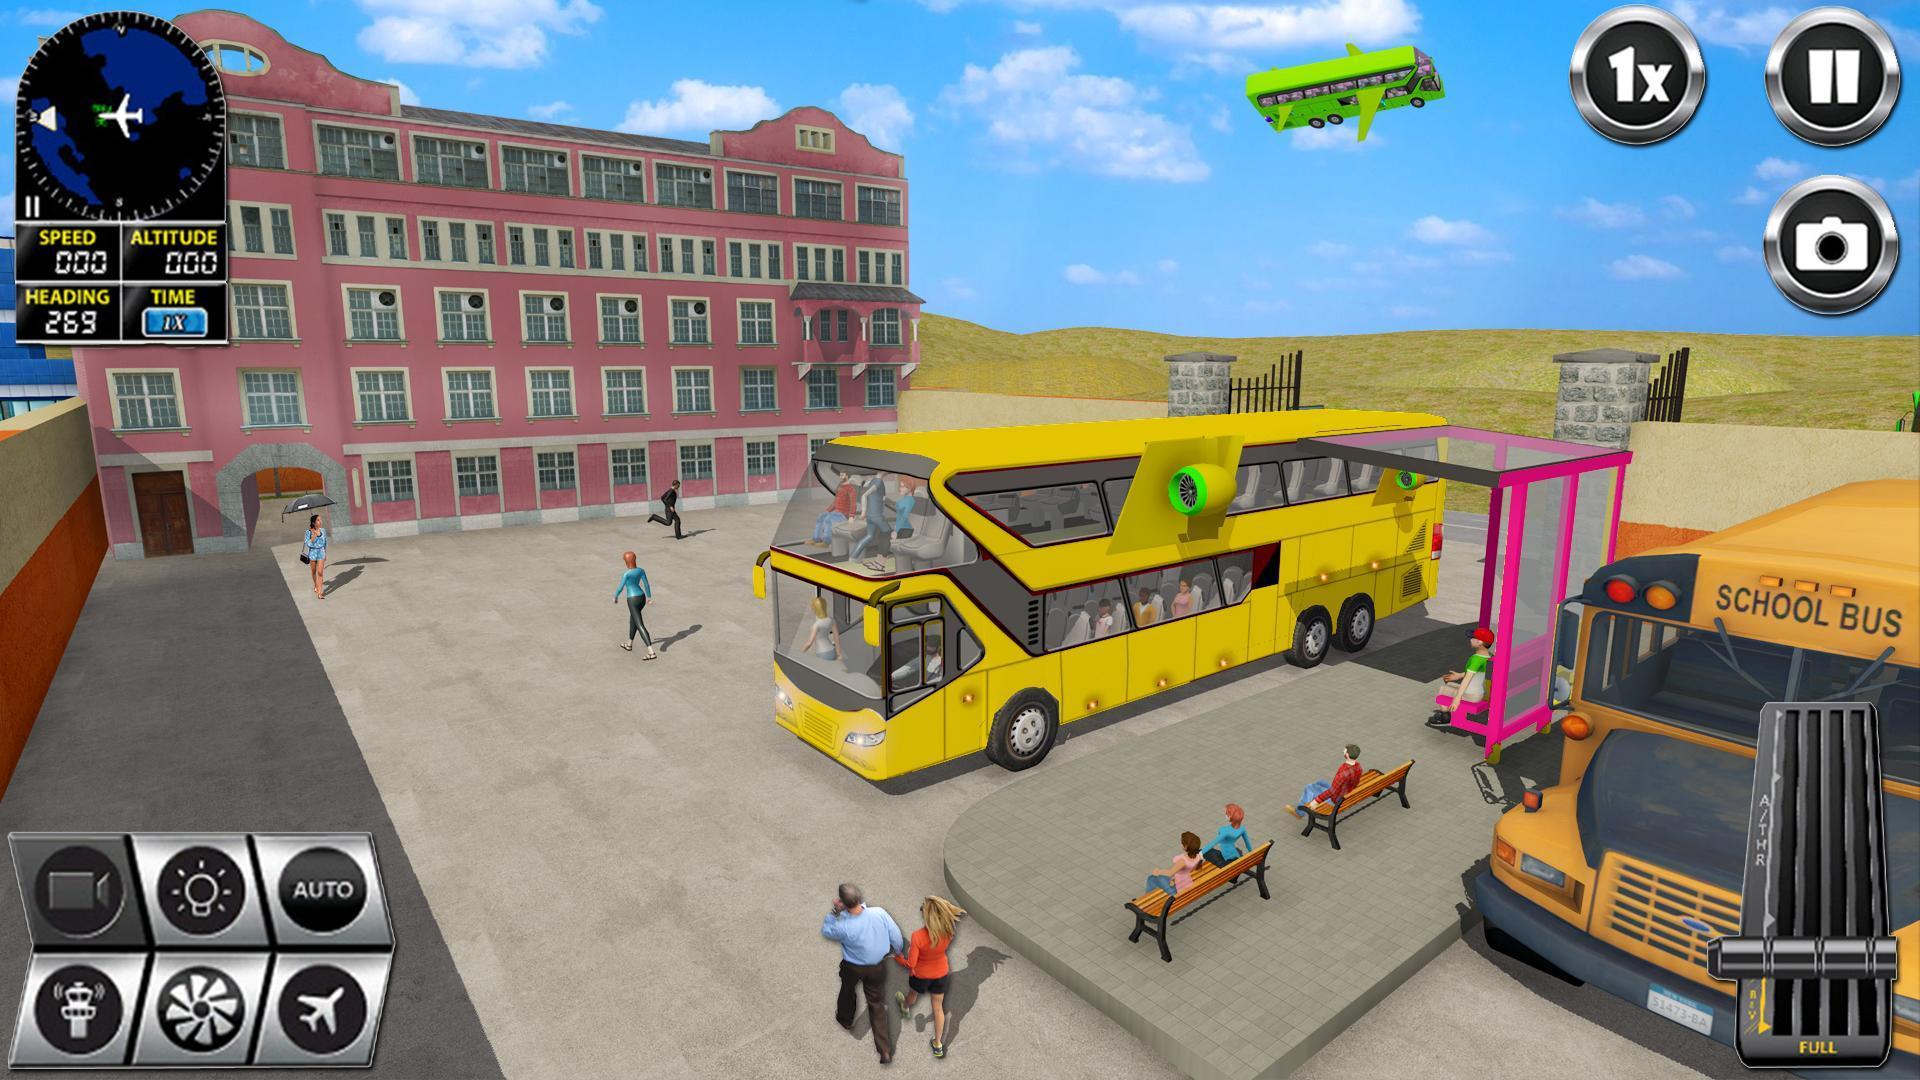 Flying Bus Driving simulator 2019: Free Bus Games 2.8 Screenshot 5